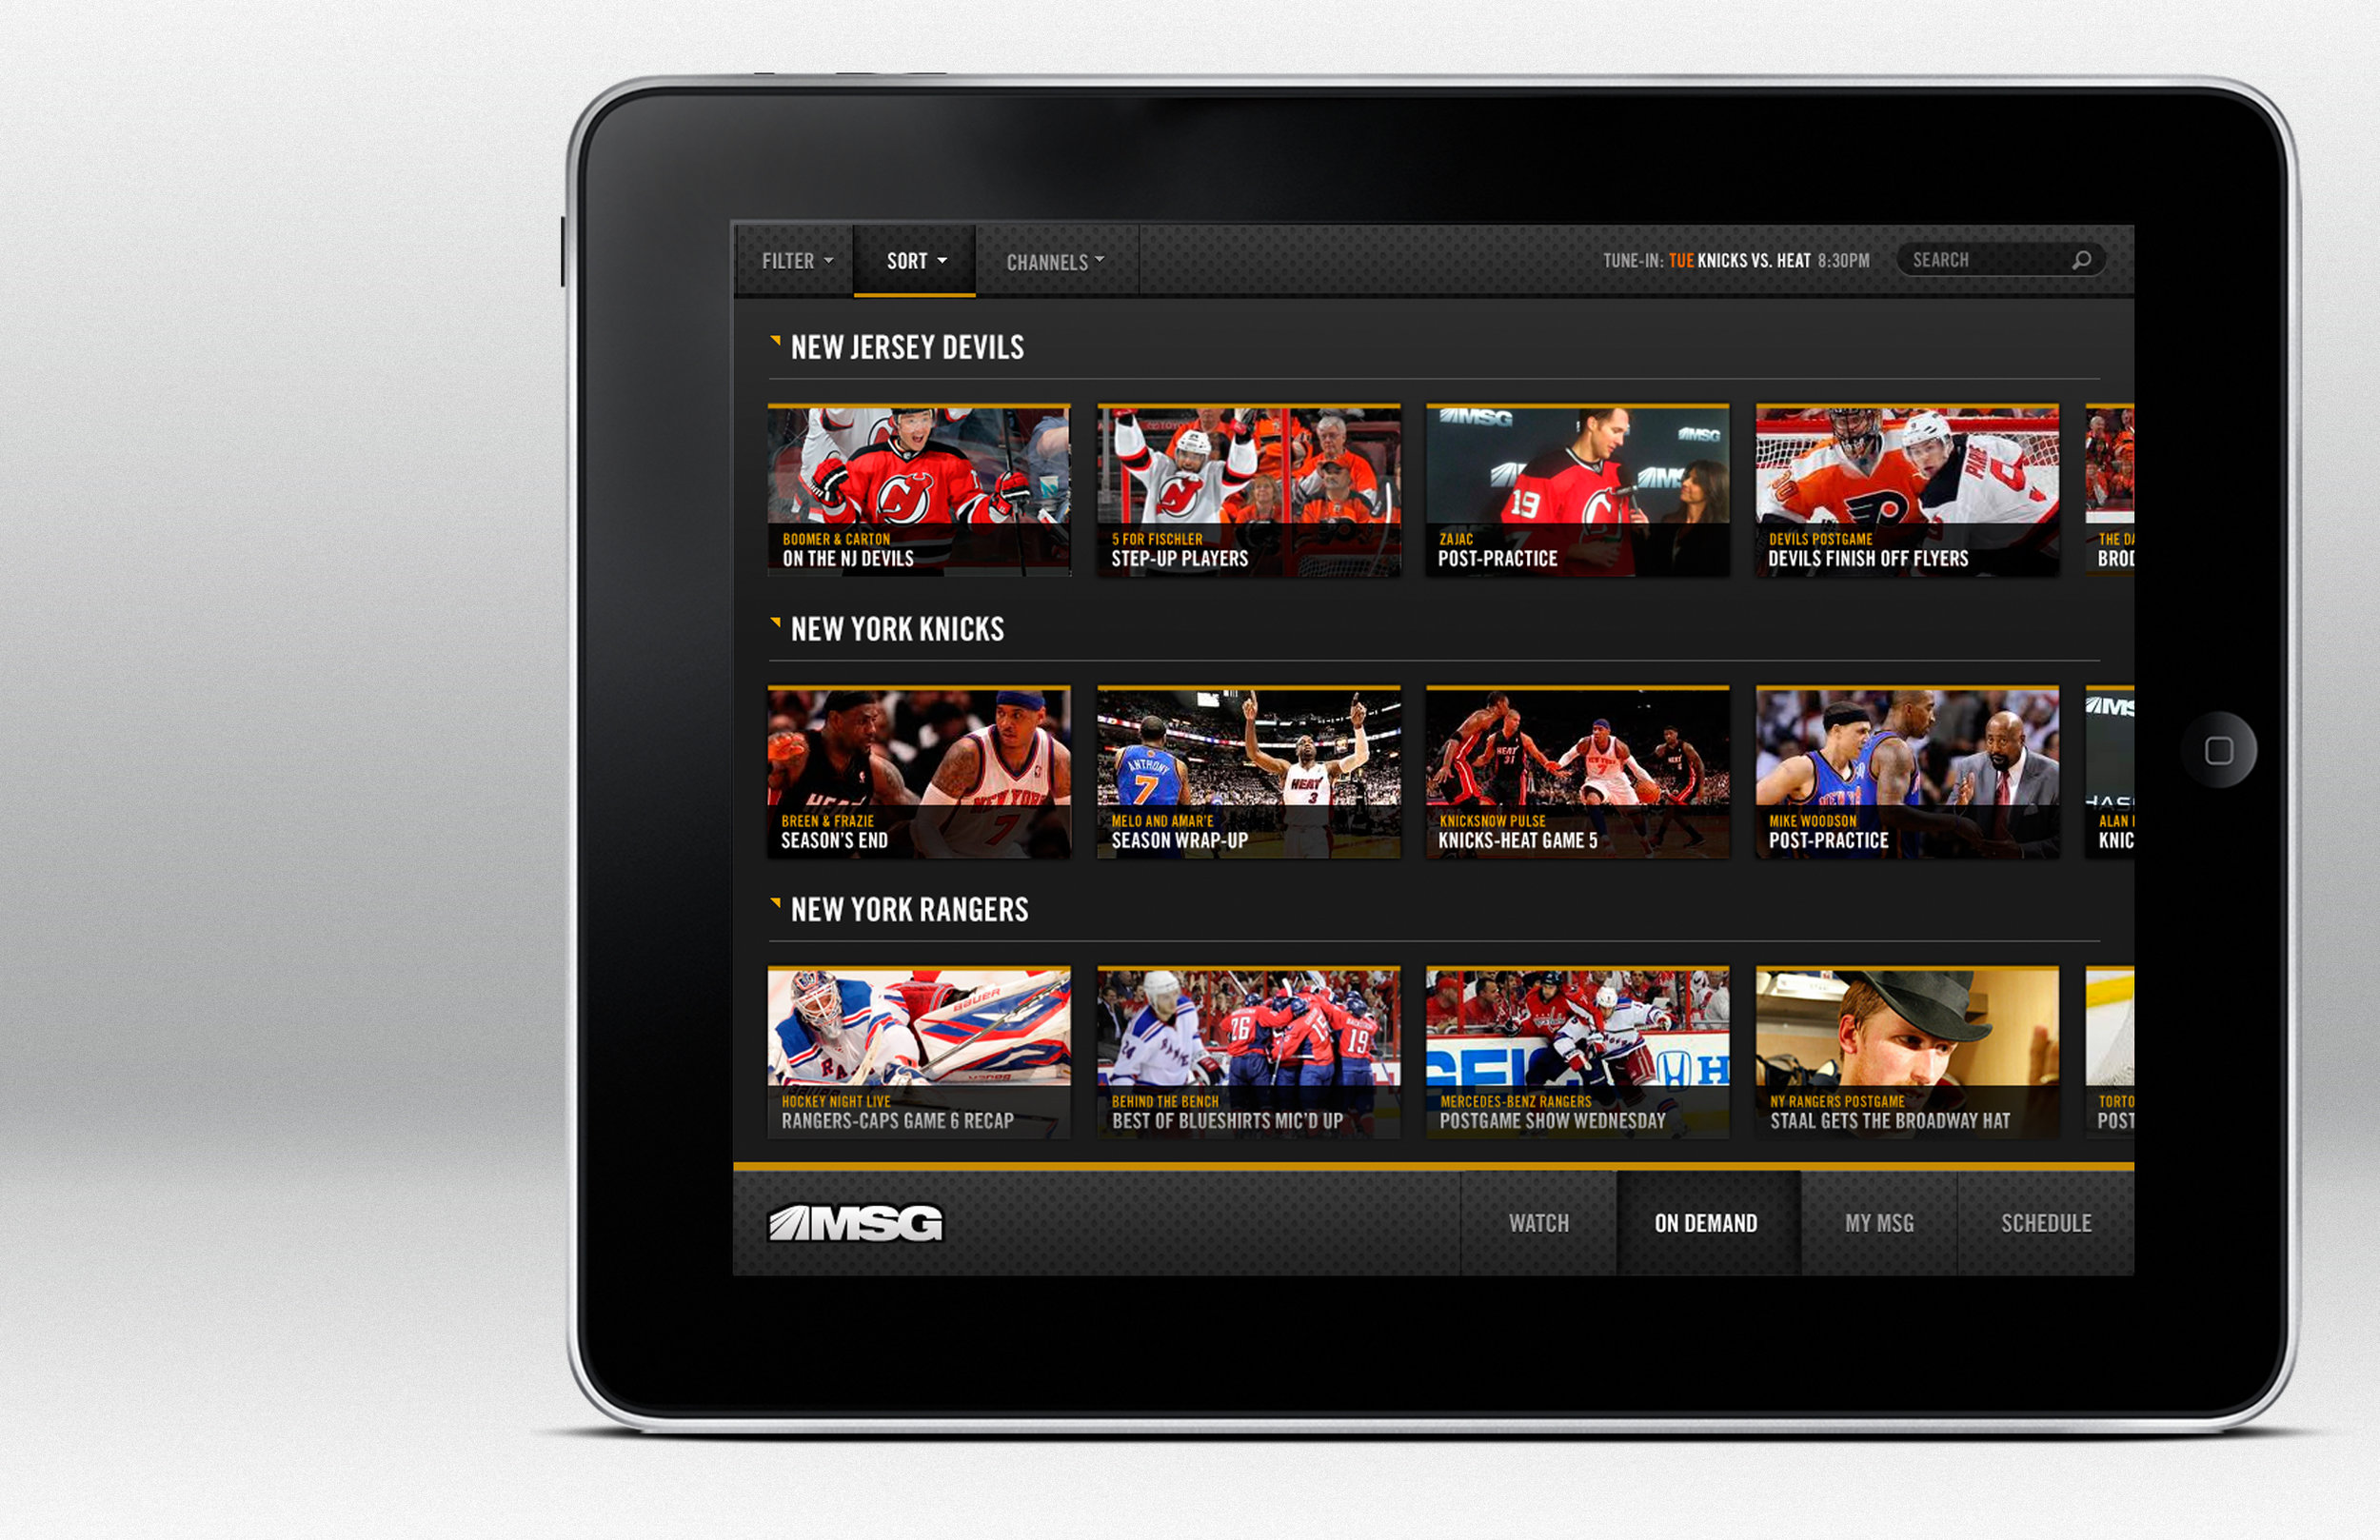 MSGGO_iPad7_ondemand.jpg